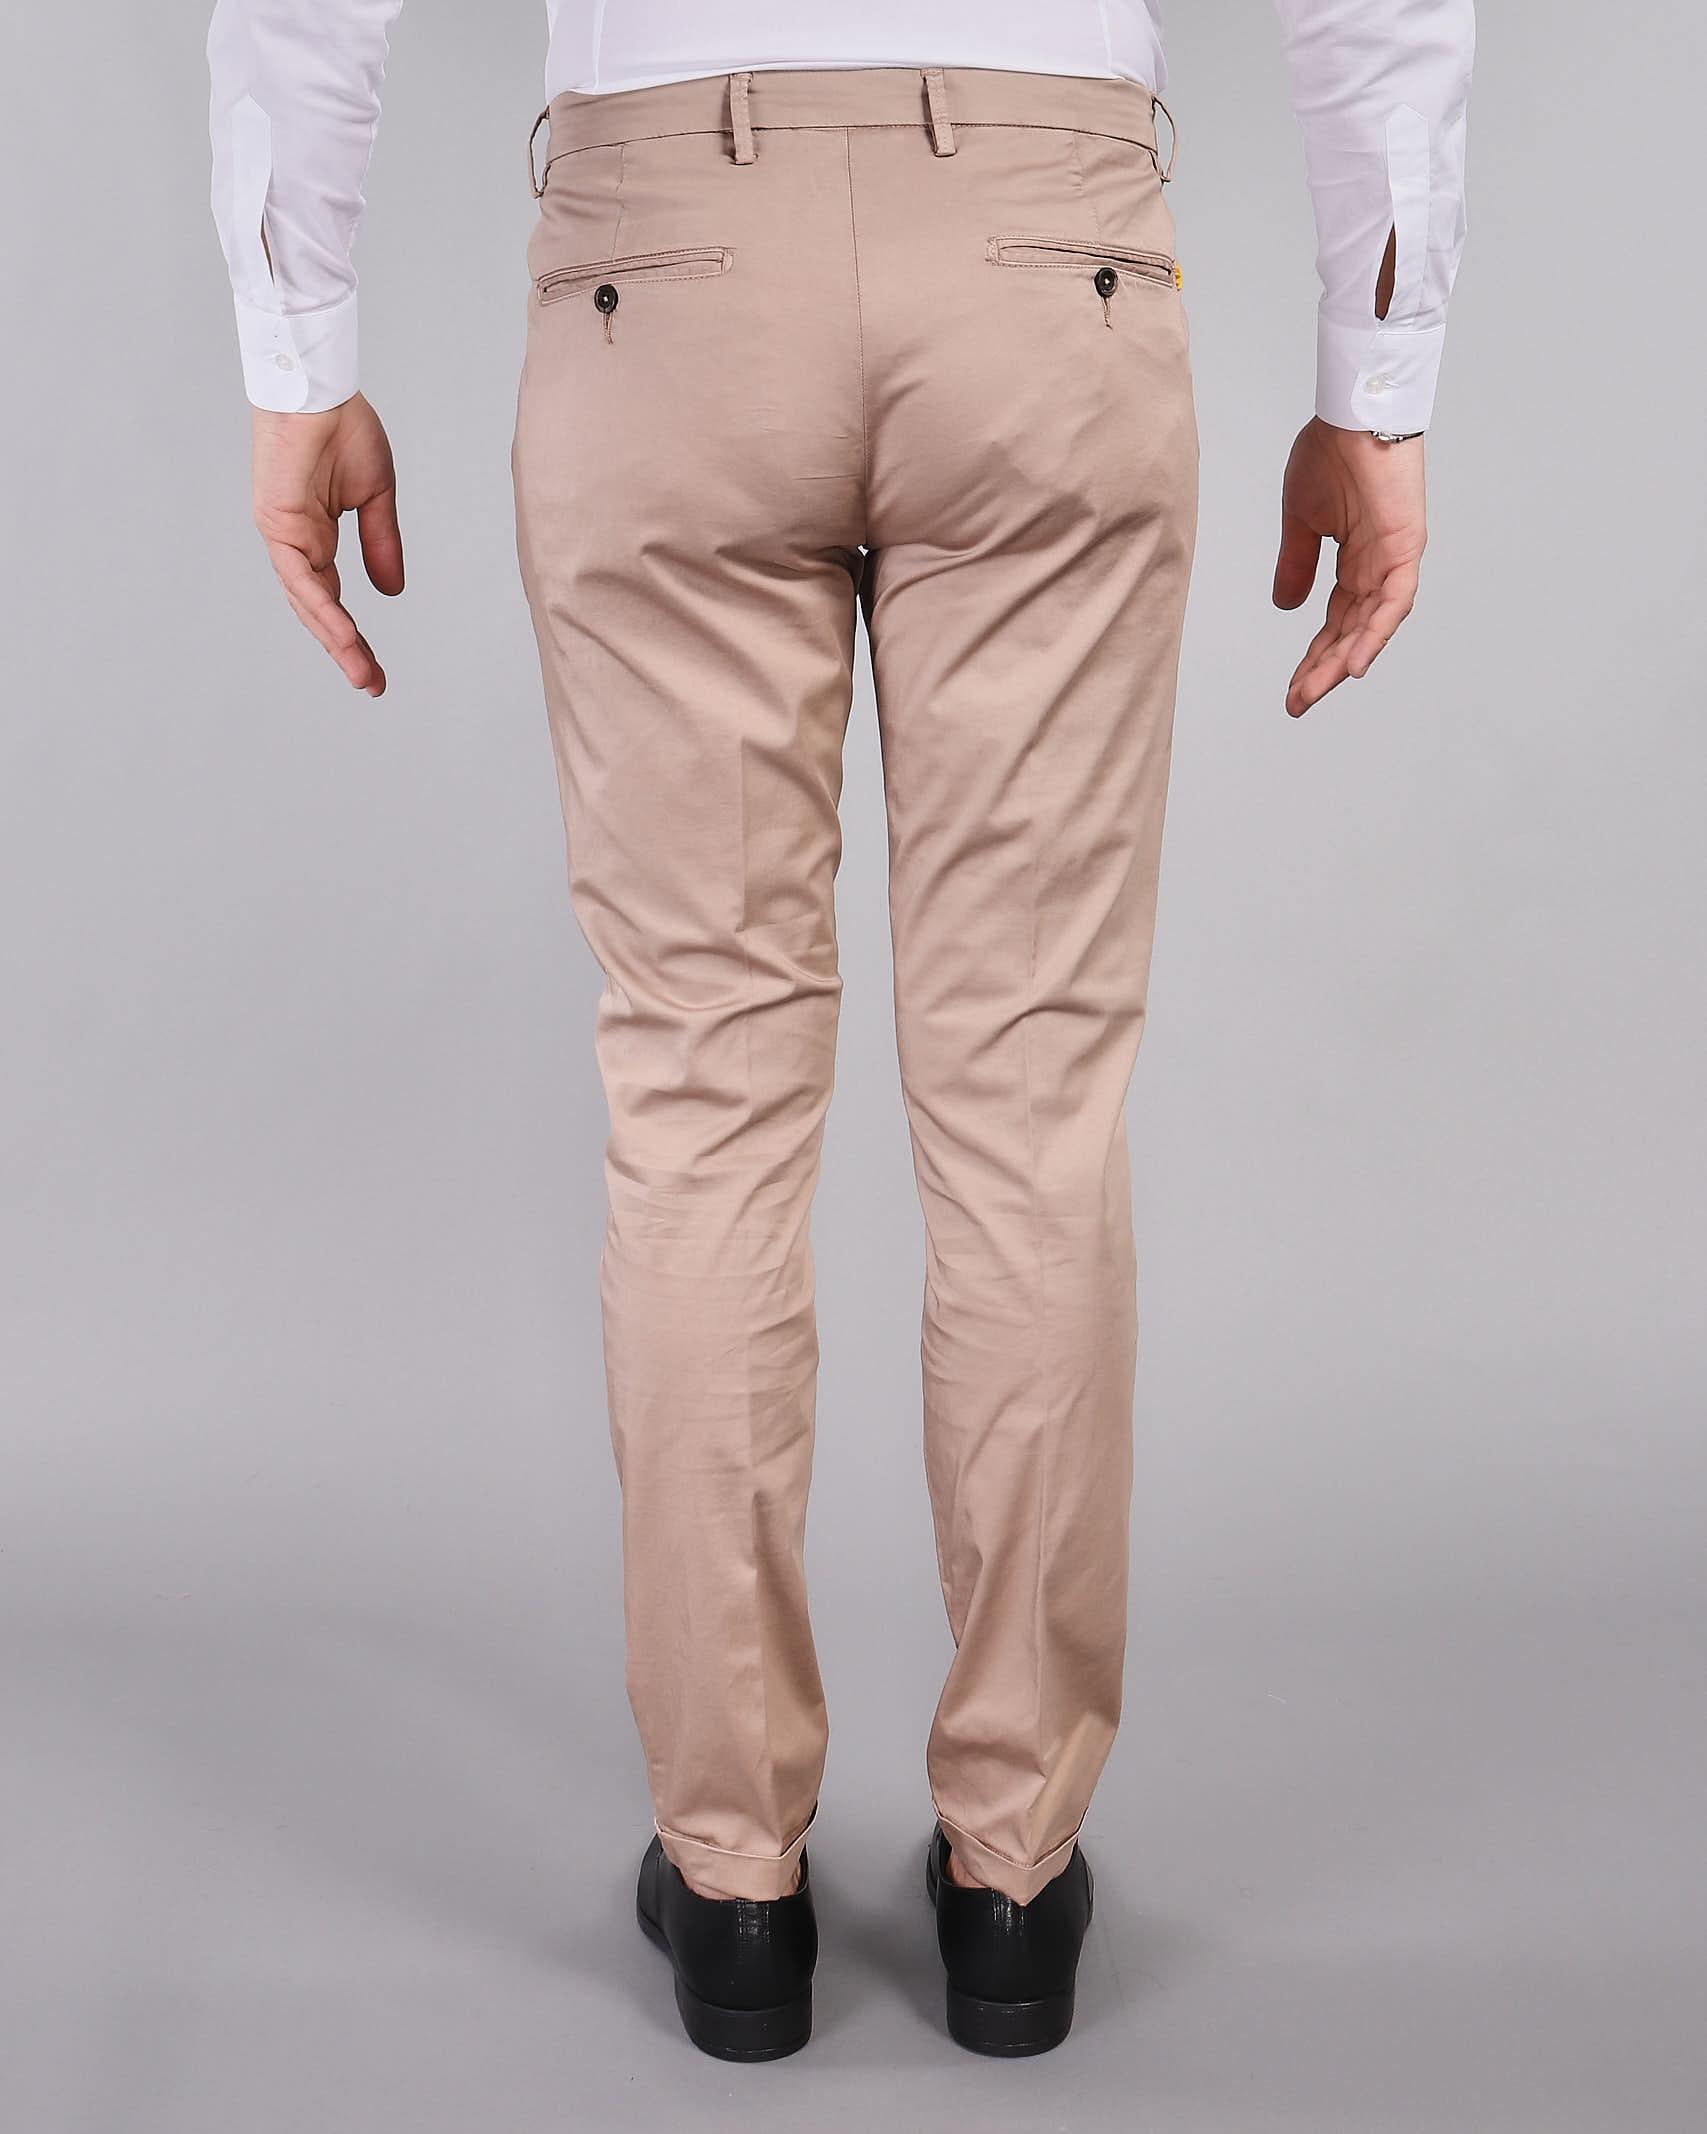 Pantalone con pences Manuel Ritz MANUEL RITZ | Pantalone | 3032P1428T21328222